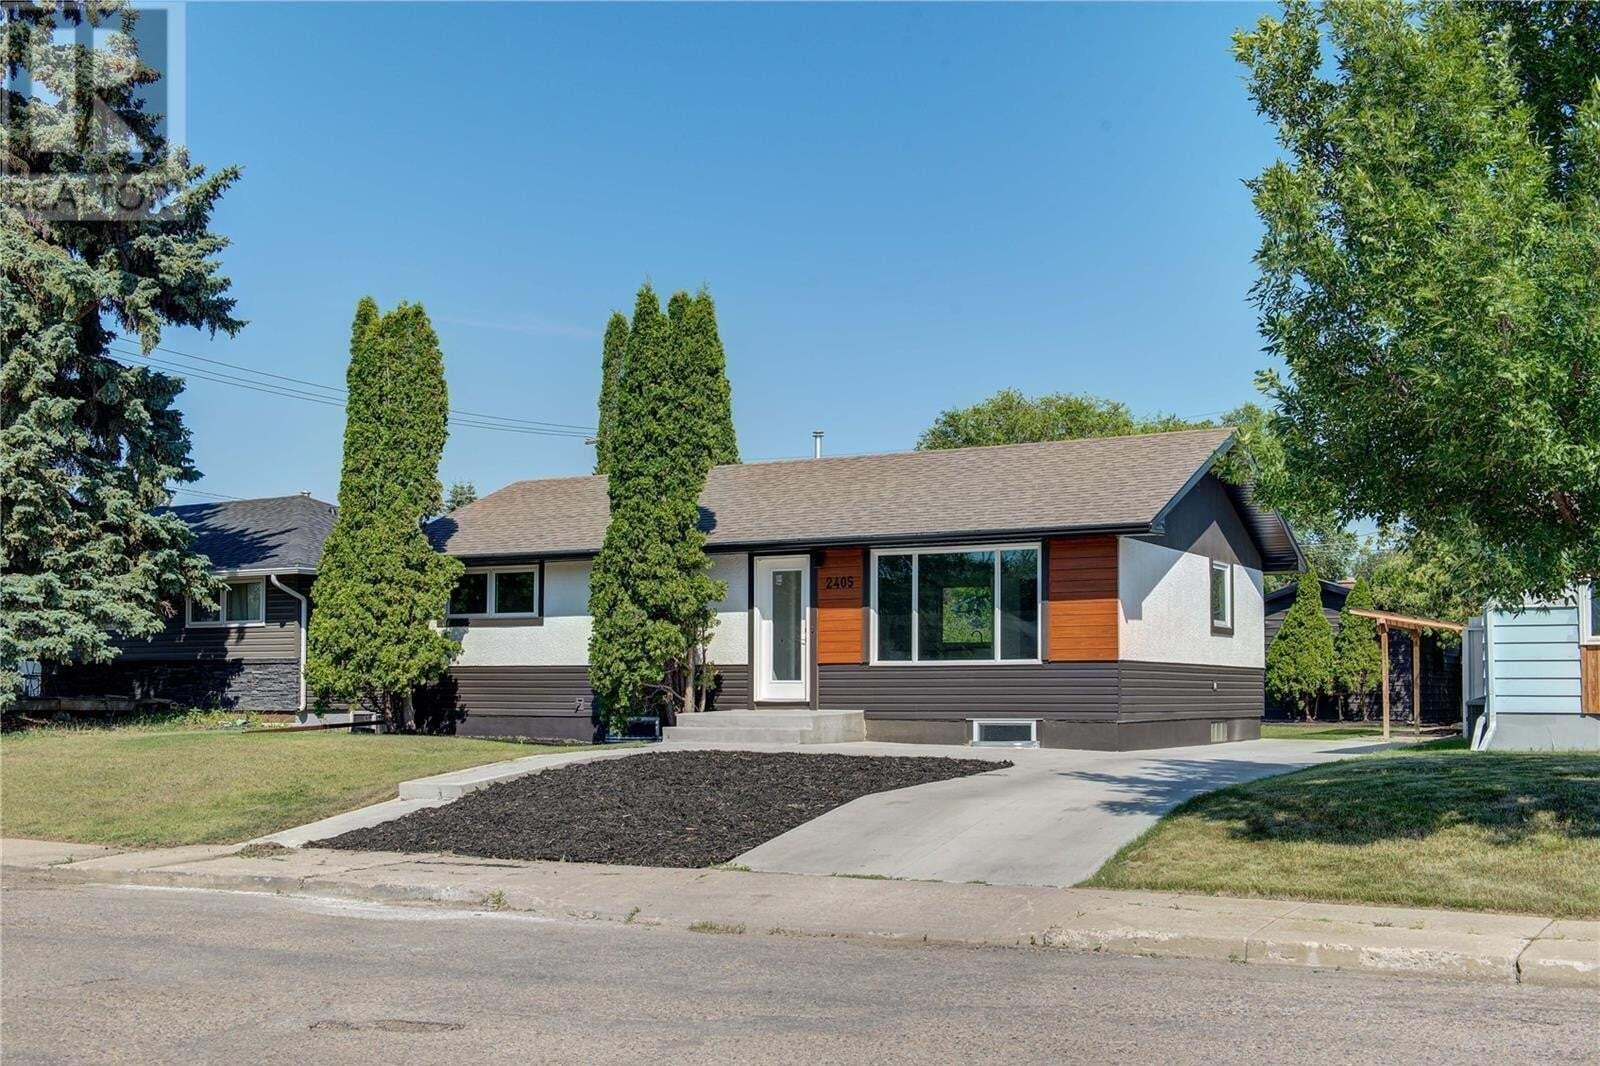 House for sale at 2405 Ewart Ave Saskatoon Saskatchewan - MLS: SK819136